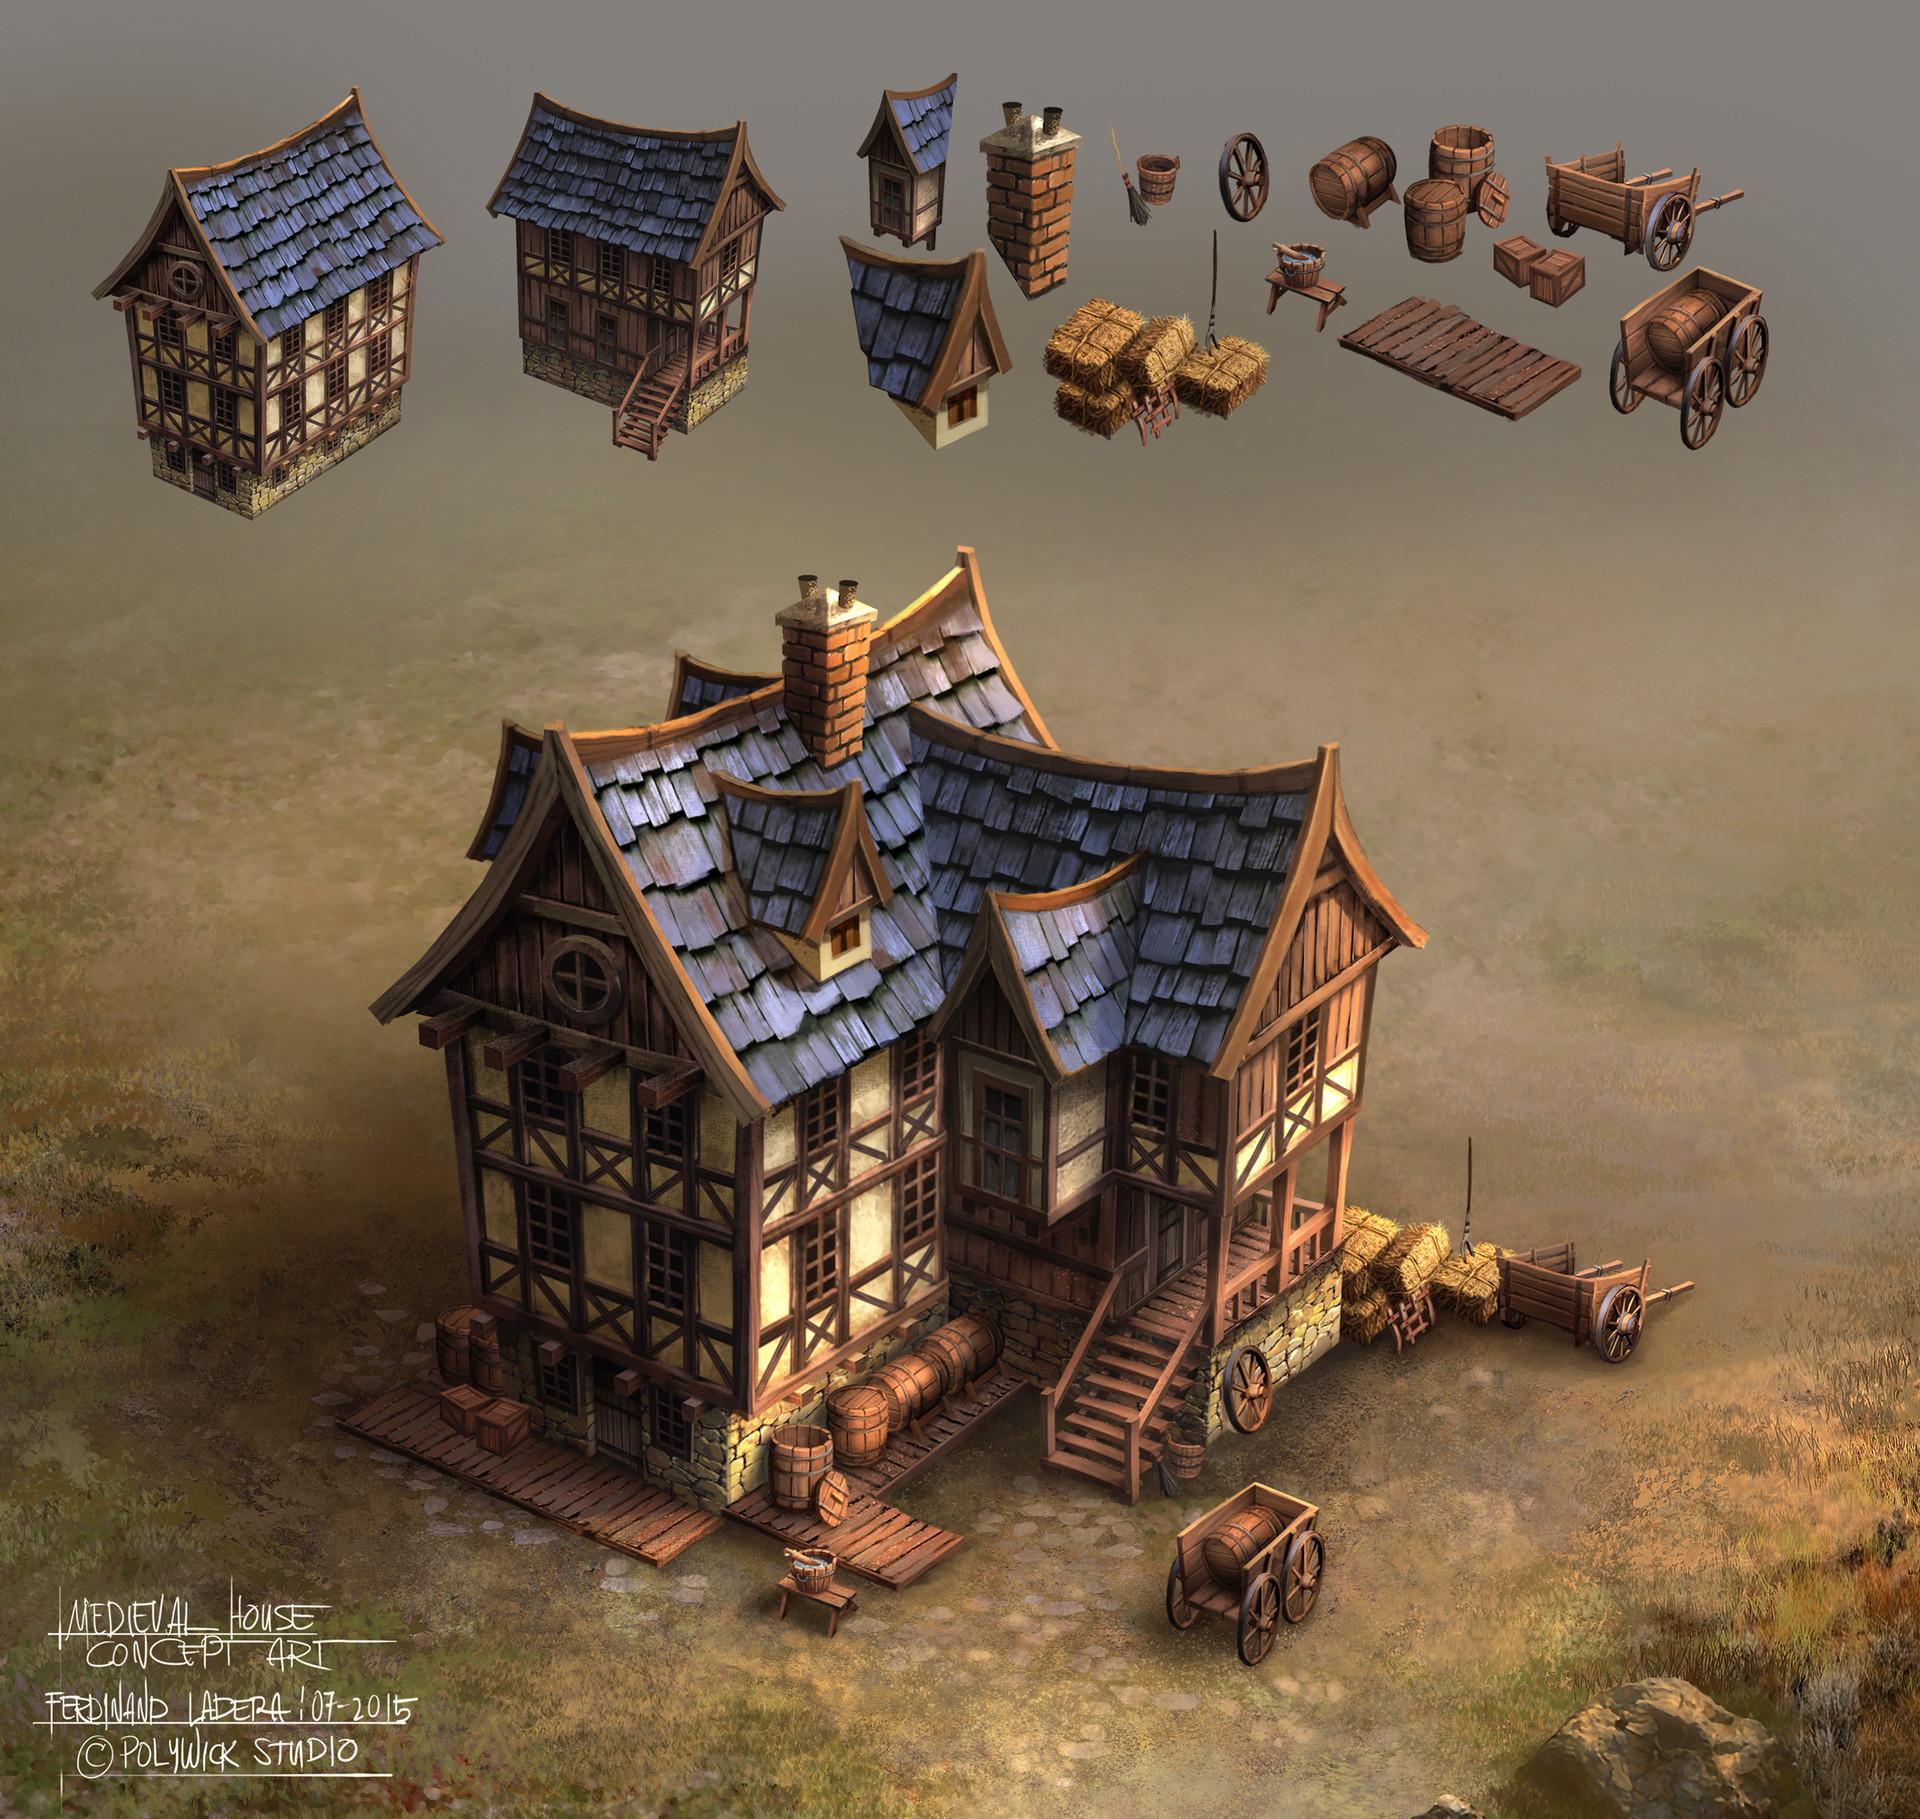 Ferdinand ladera medievalhouse